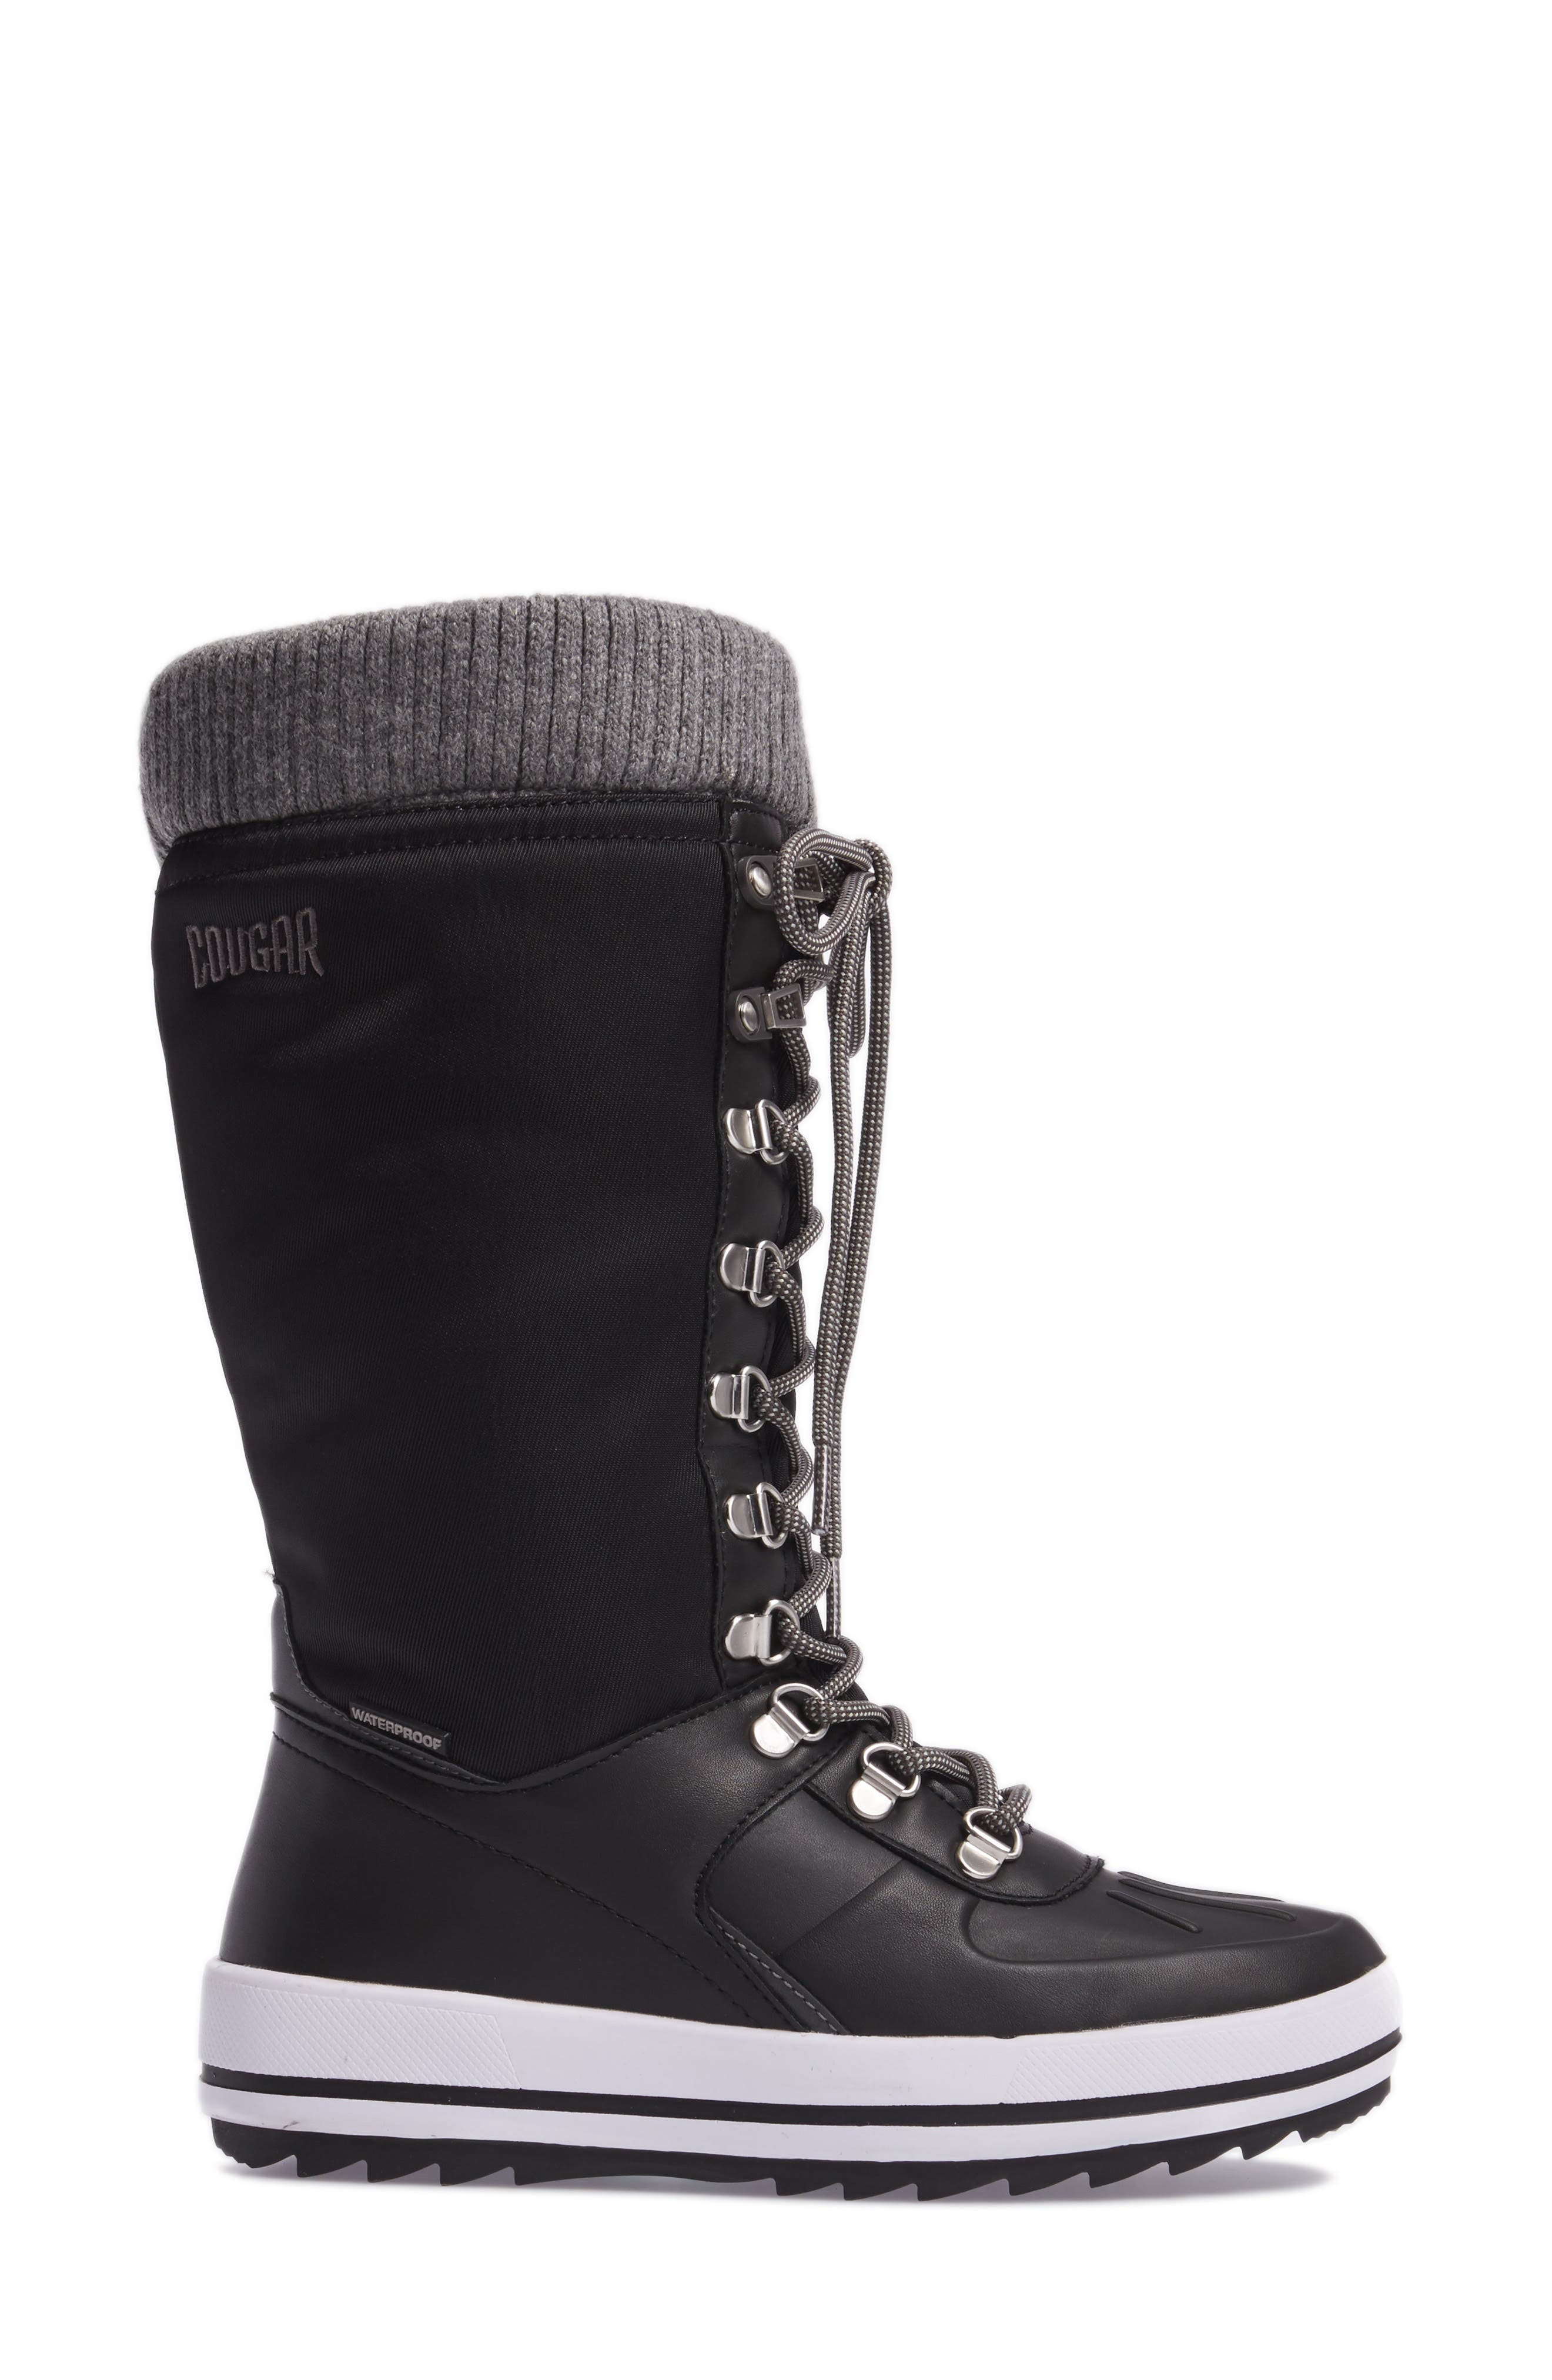 Vancouver Waterproof Winter Boot,                             Alternate thumbnail 3, color,                             BLACK